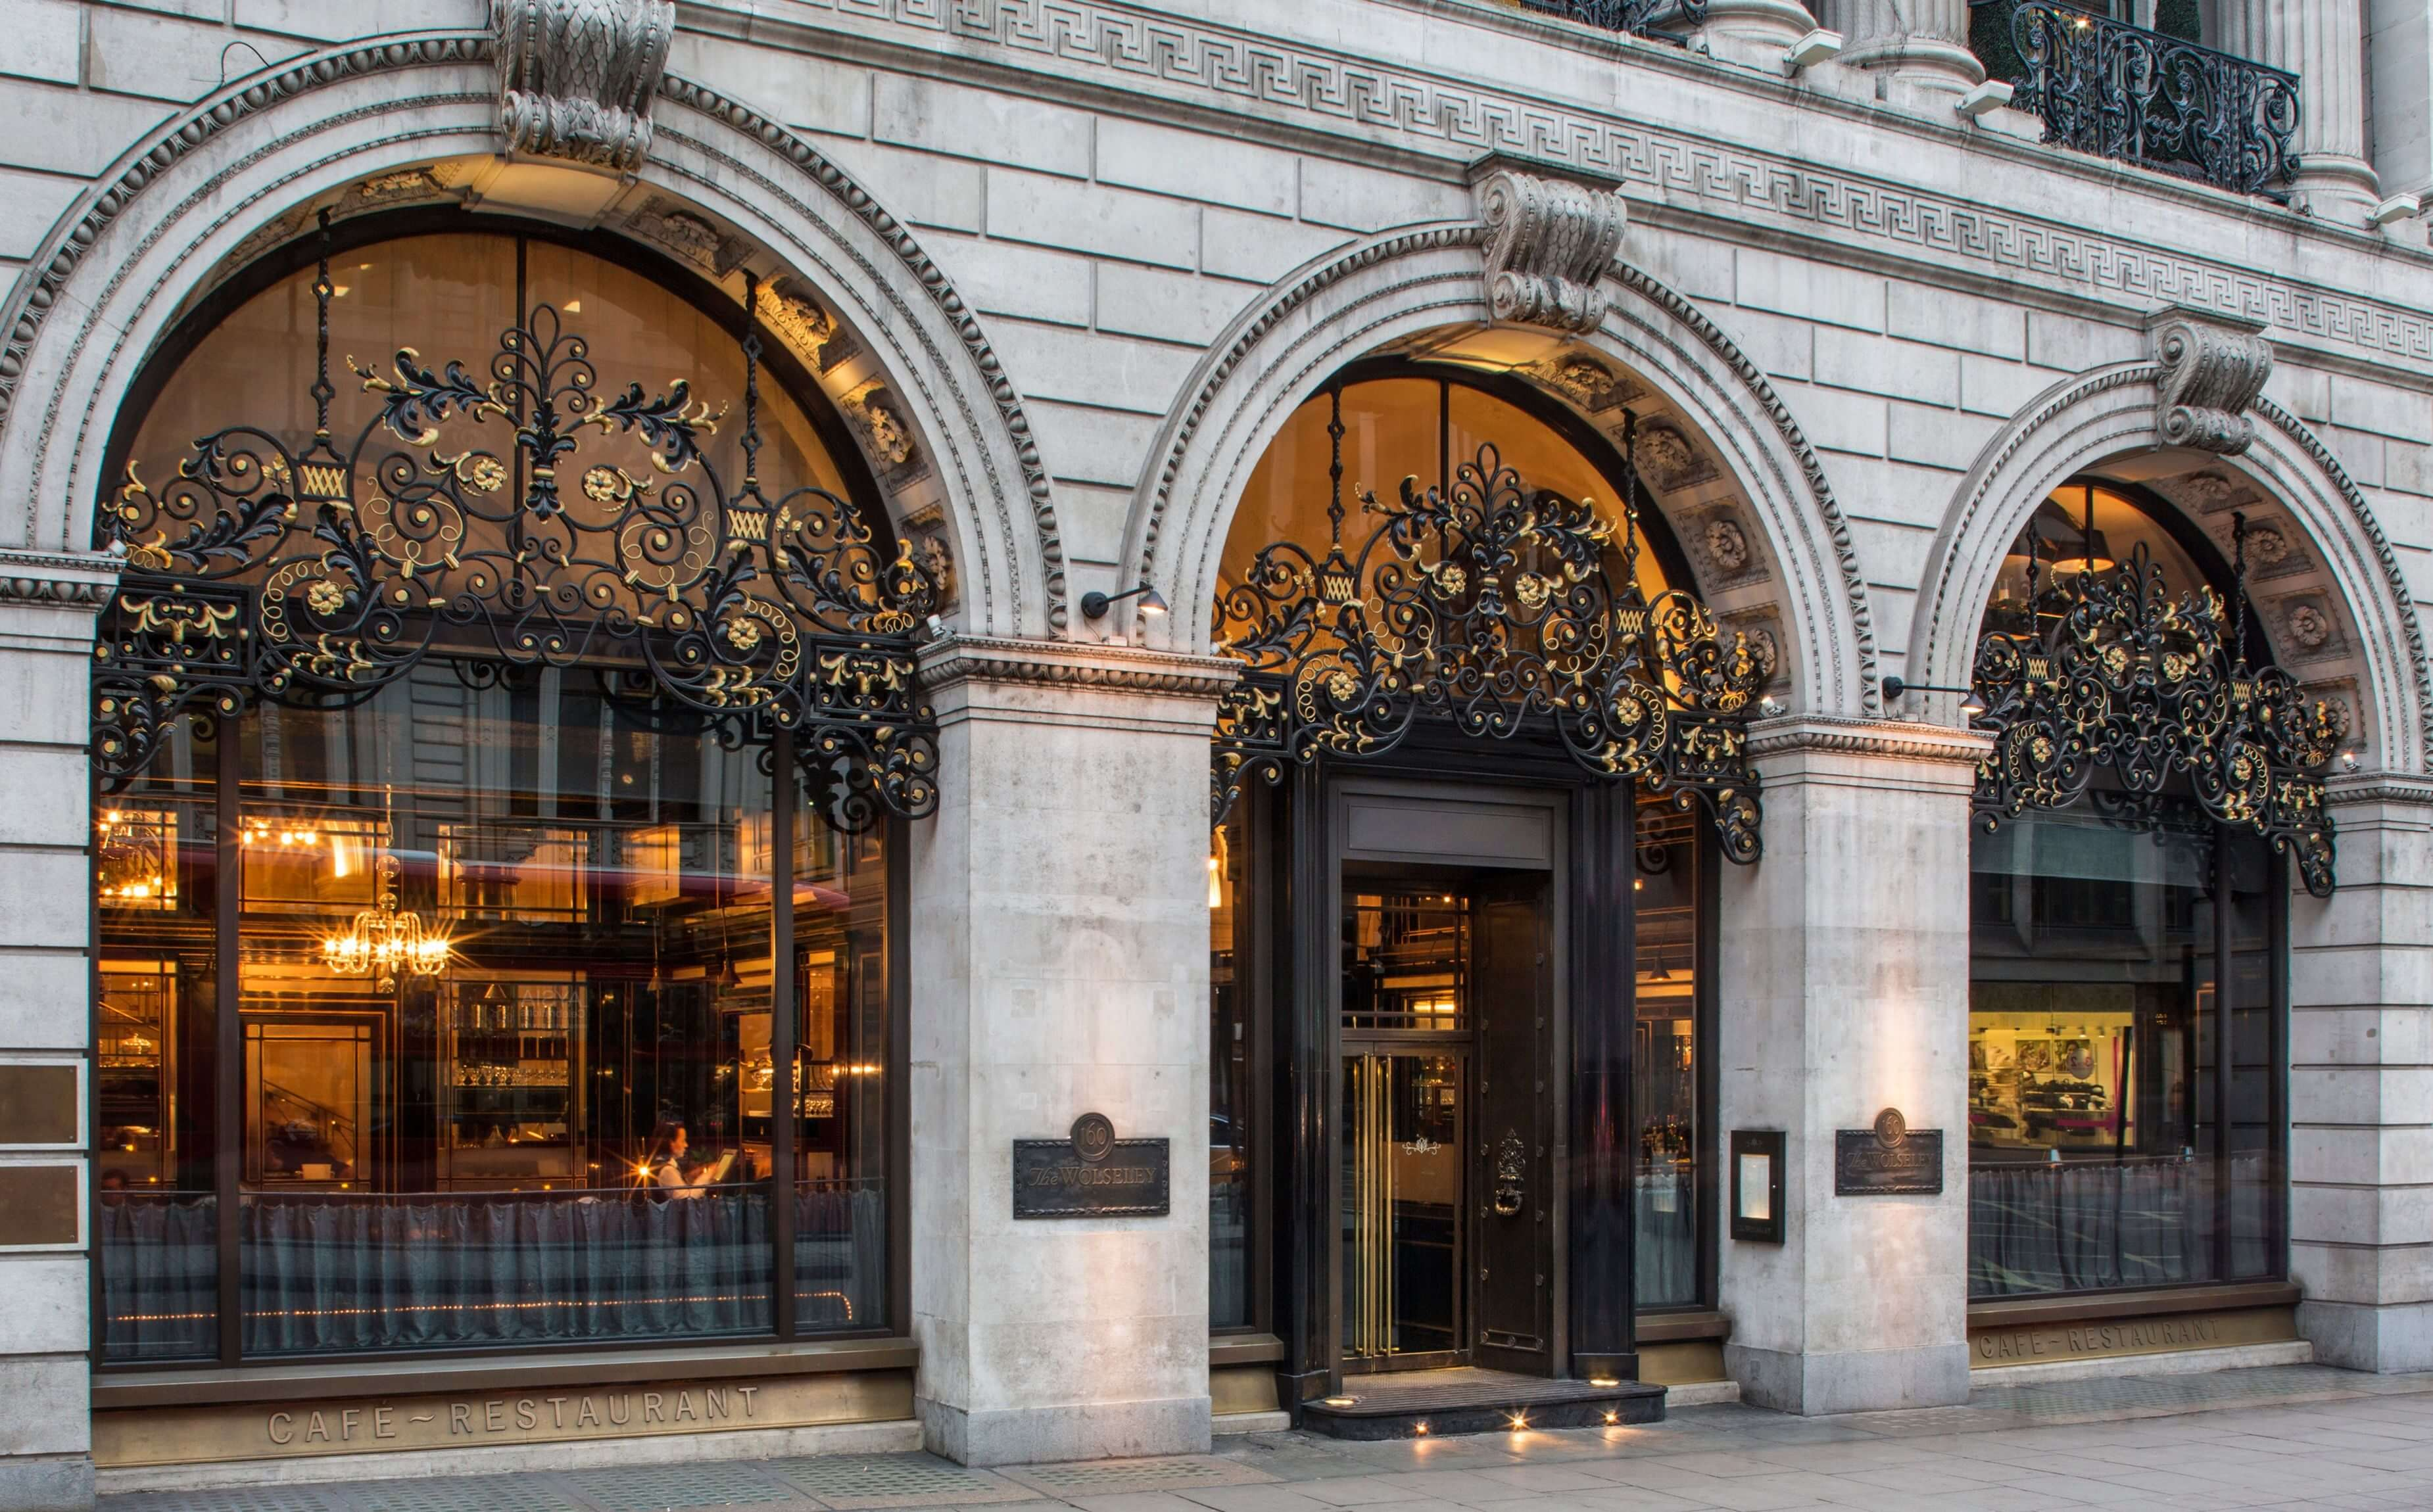 Restaurant In Mayfair London The Wolseley